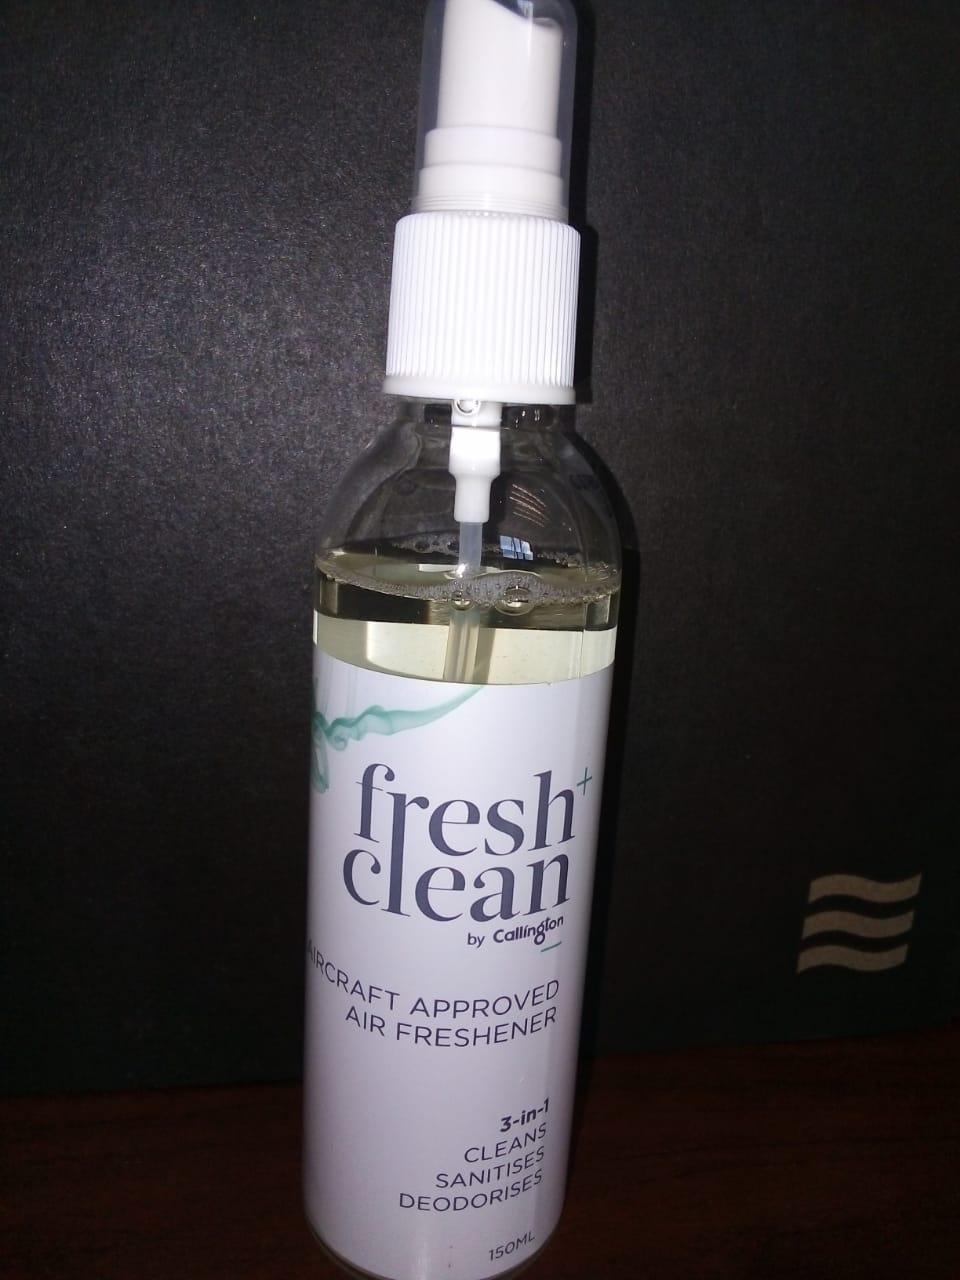 Carlton fresh clean Air freshner